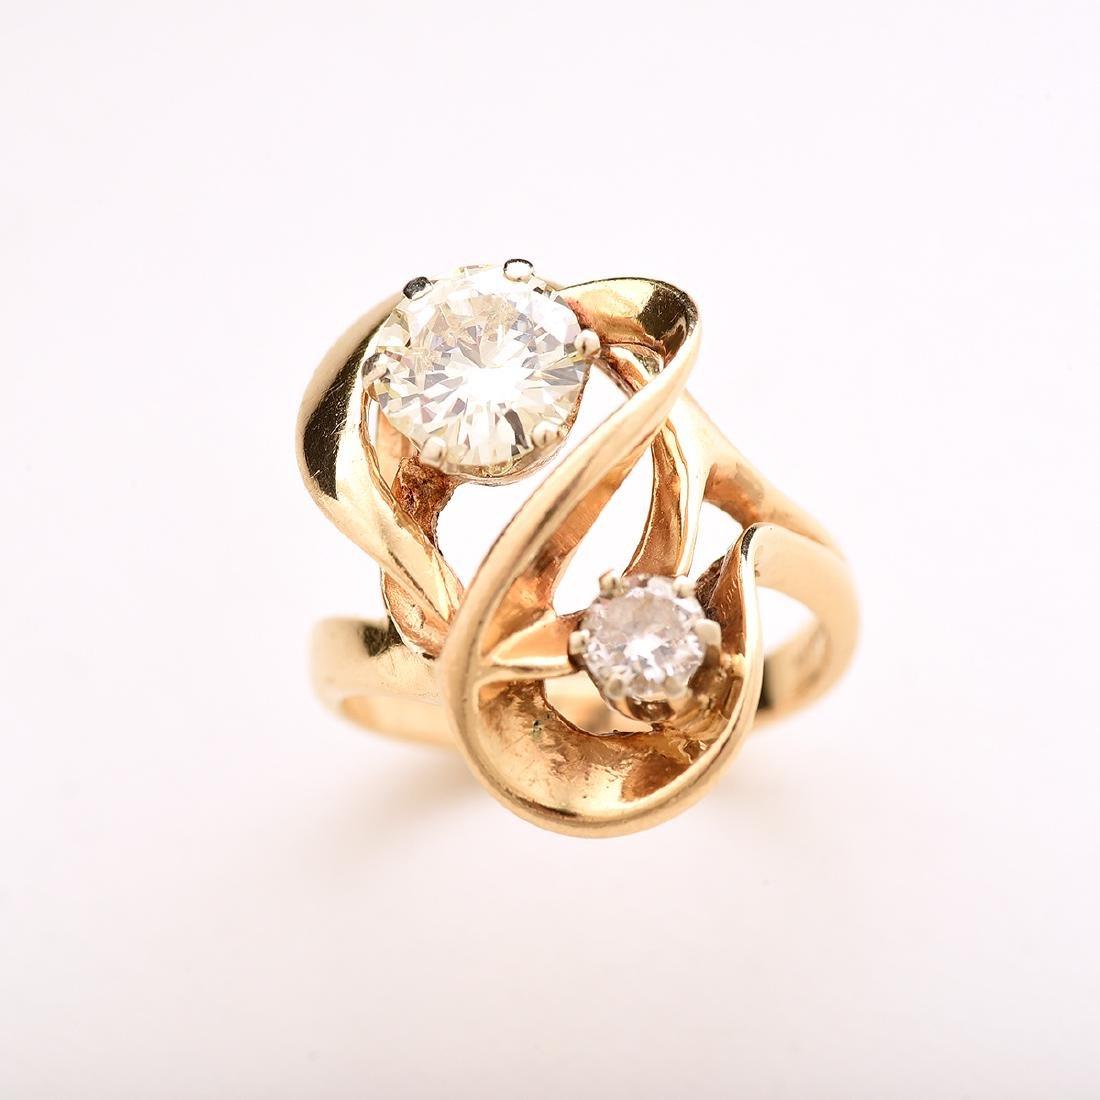 Diamond, 14k Yellow Gold Ring. - 2